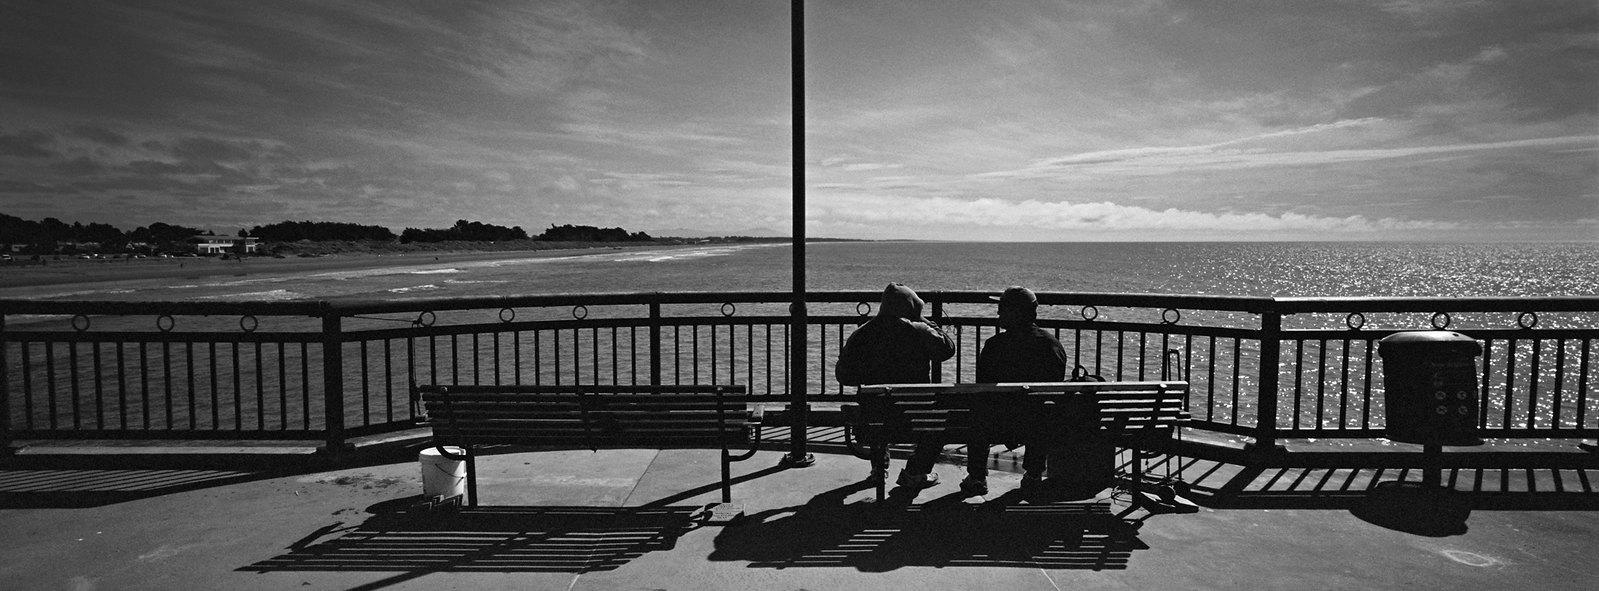 Pair on Pier